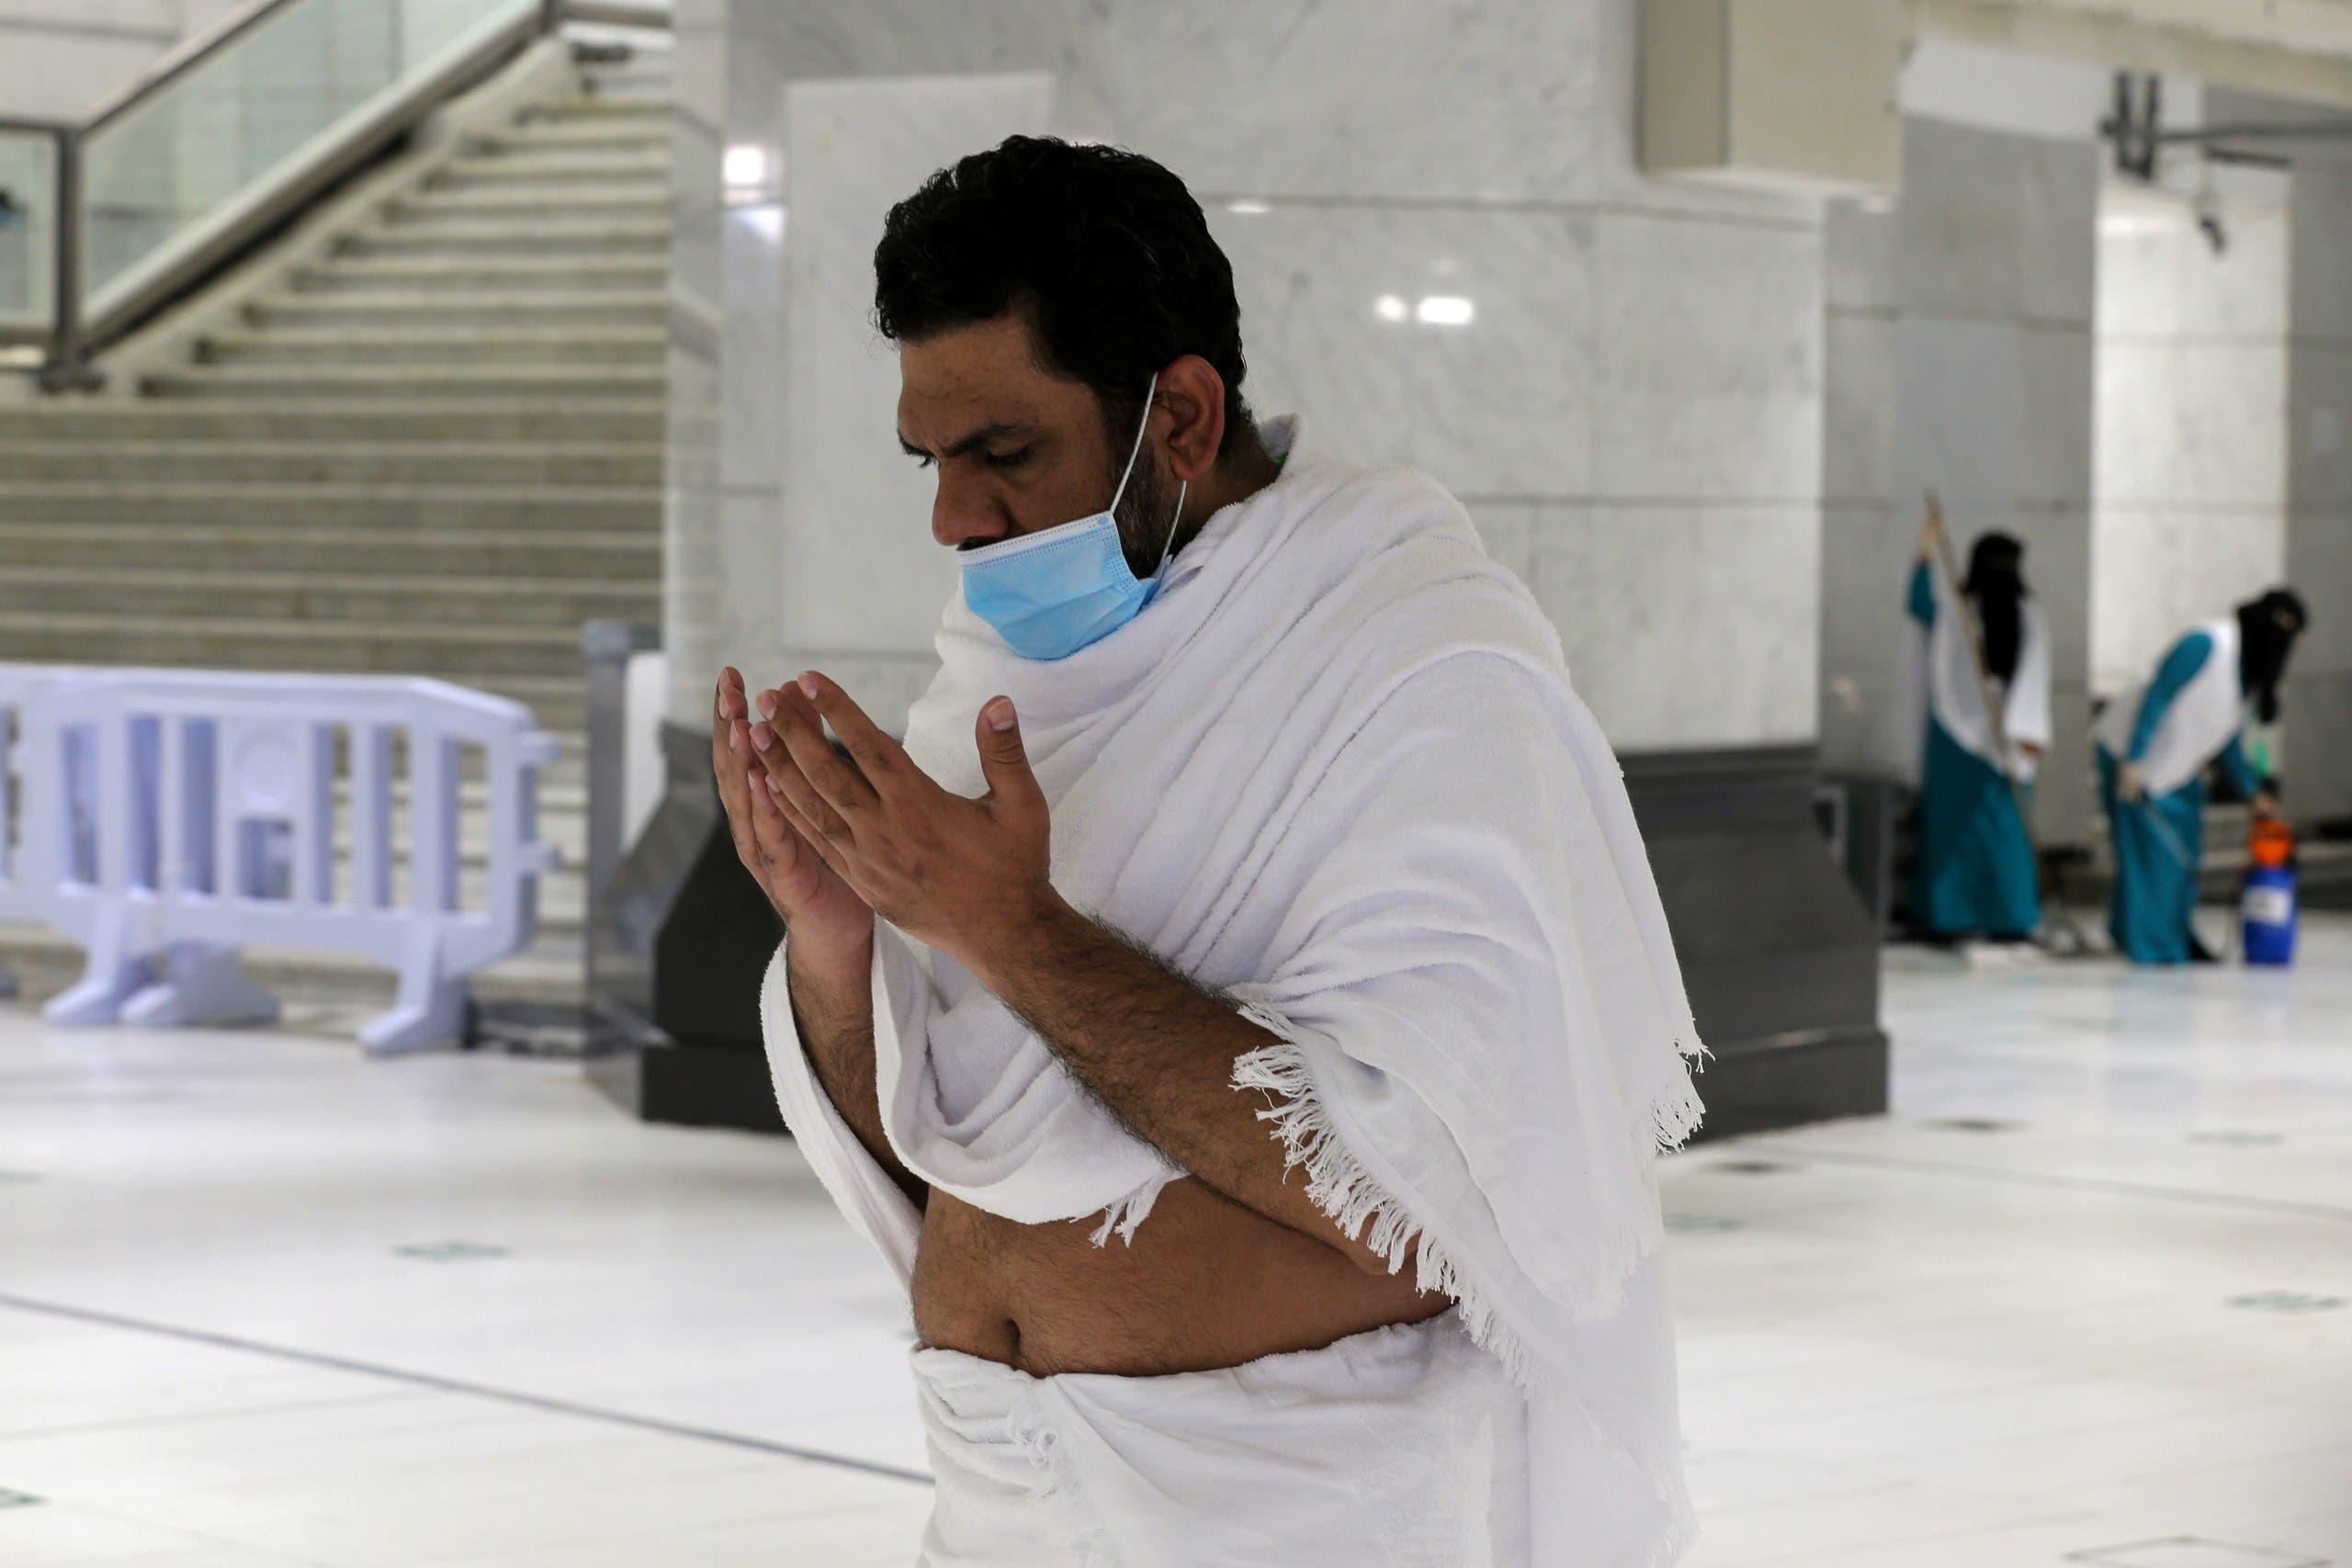 A Muslim pilgrim prays in the Grand Mosque in the holy city of Mecca, Saudi Arabia July 17, 2021. (Reuters)